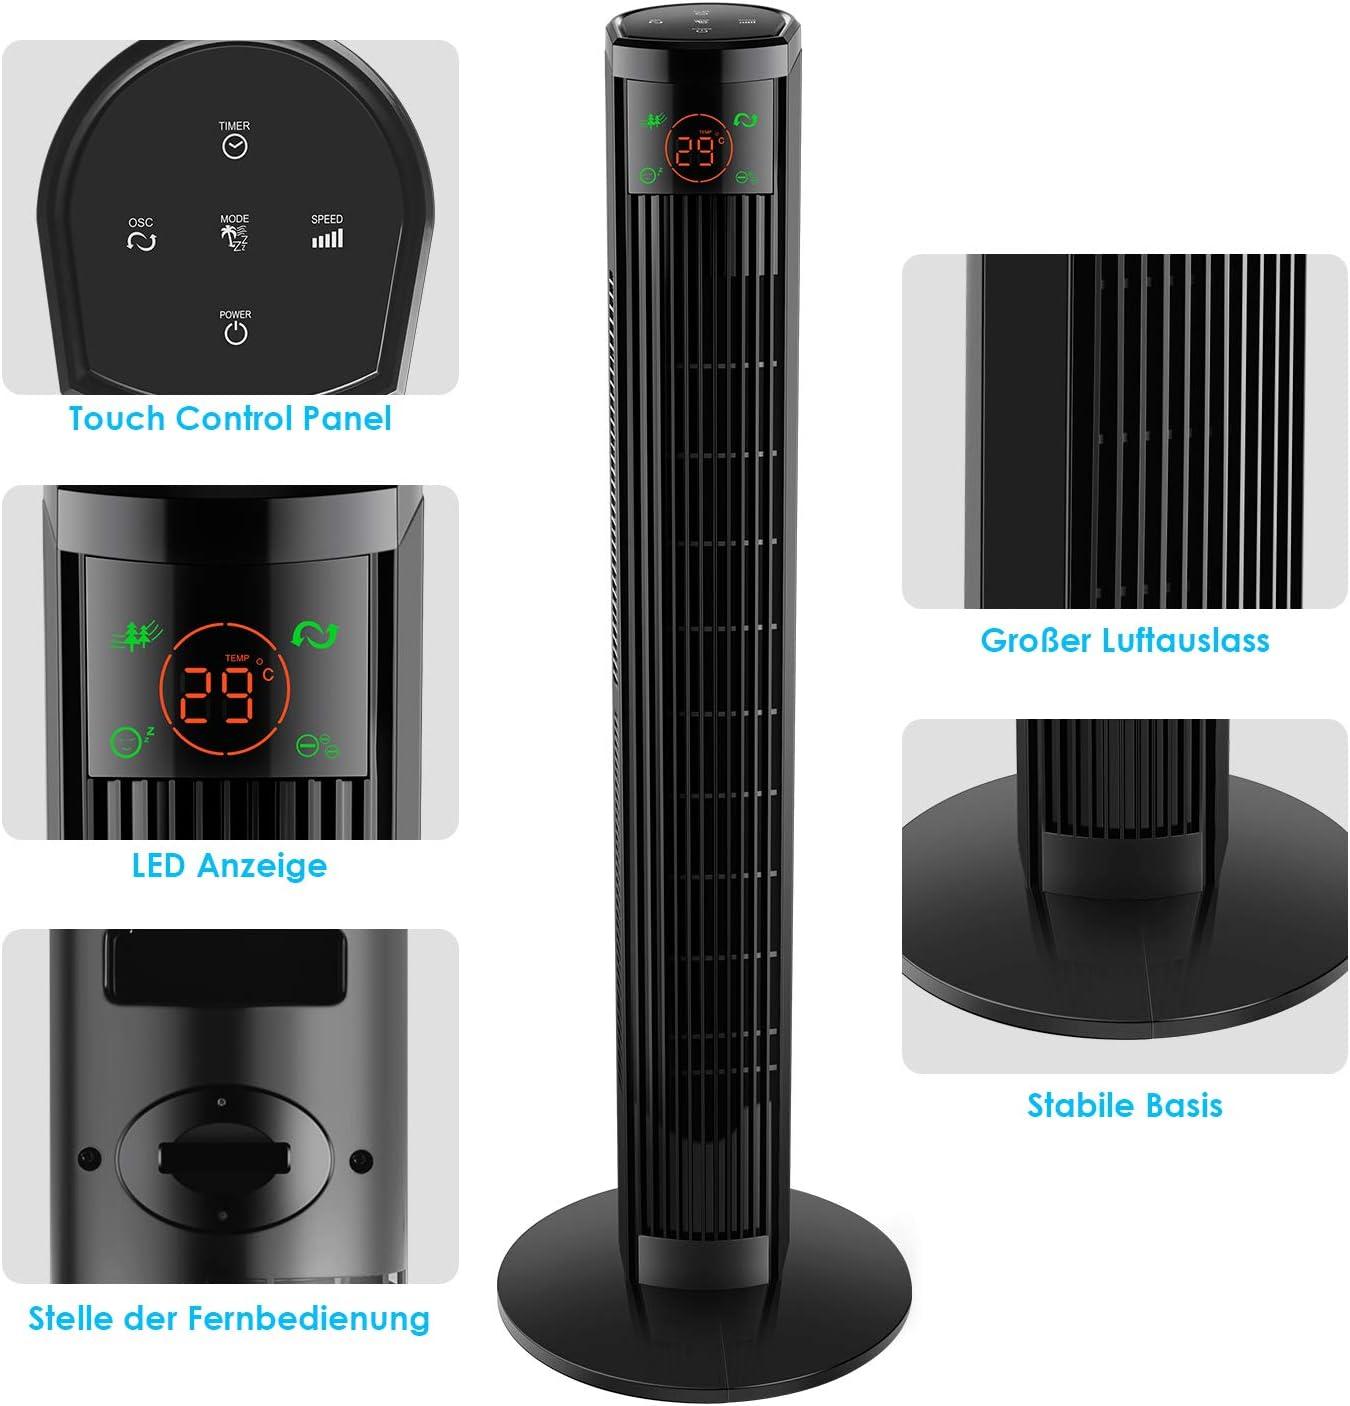 96 cm, 3 velocidades, 3 modos, pantalla LED y panel t/áctil, temporizador de 12 h, oscilante de 60/°, bajo ruido, 45 W color negro Ventilador de torre con mando a distancia Amzdeal